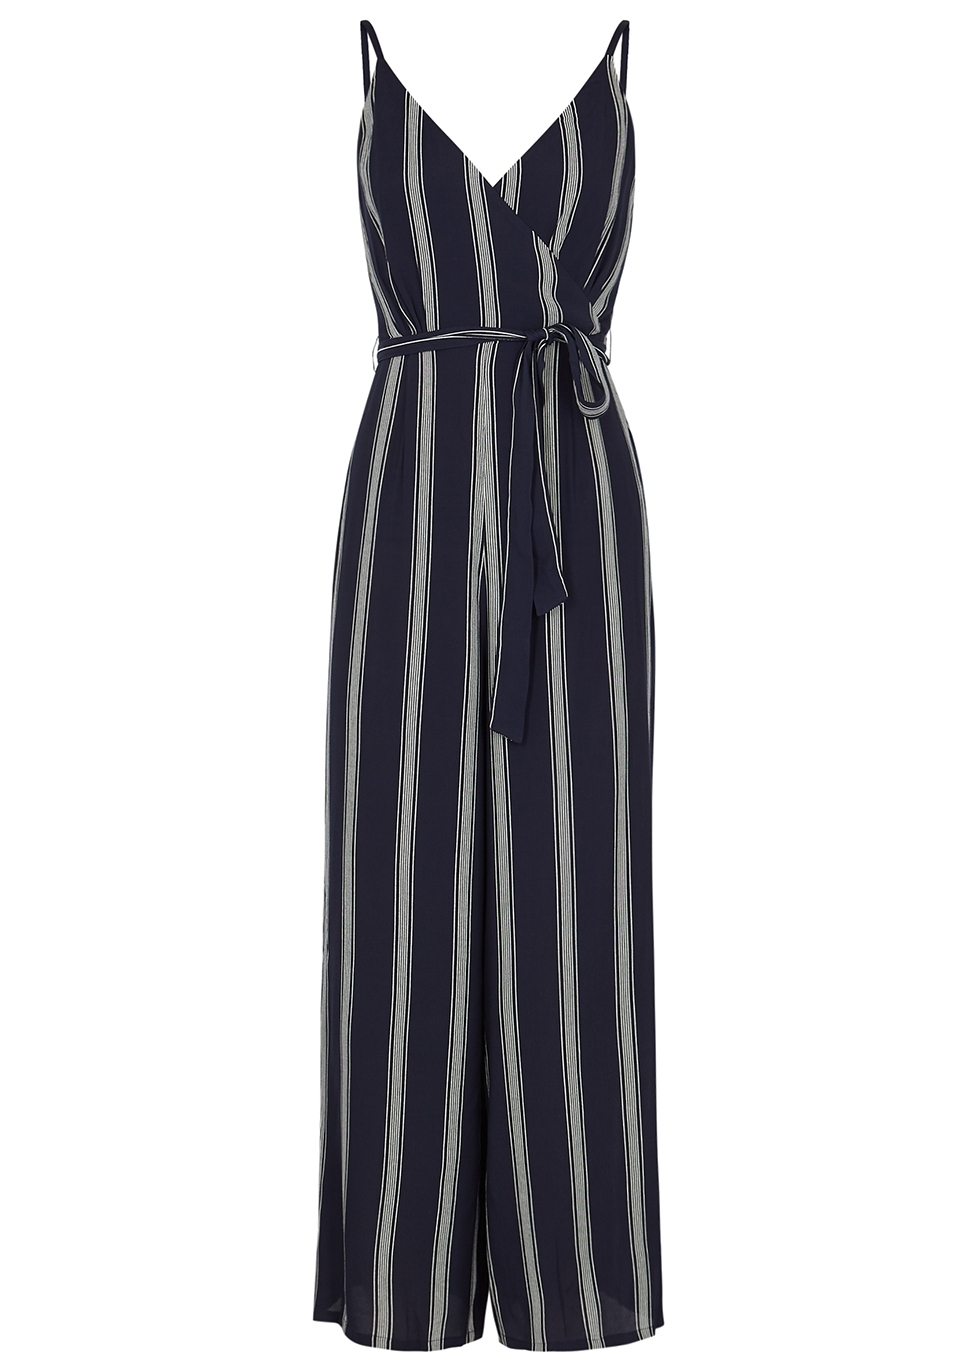 5e22db19b3e Designer Jumpsuits and Luxury Playsuits - Harvey Nichols